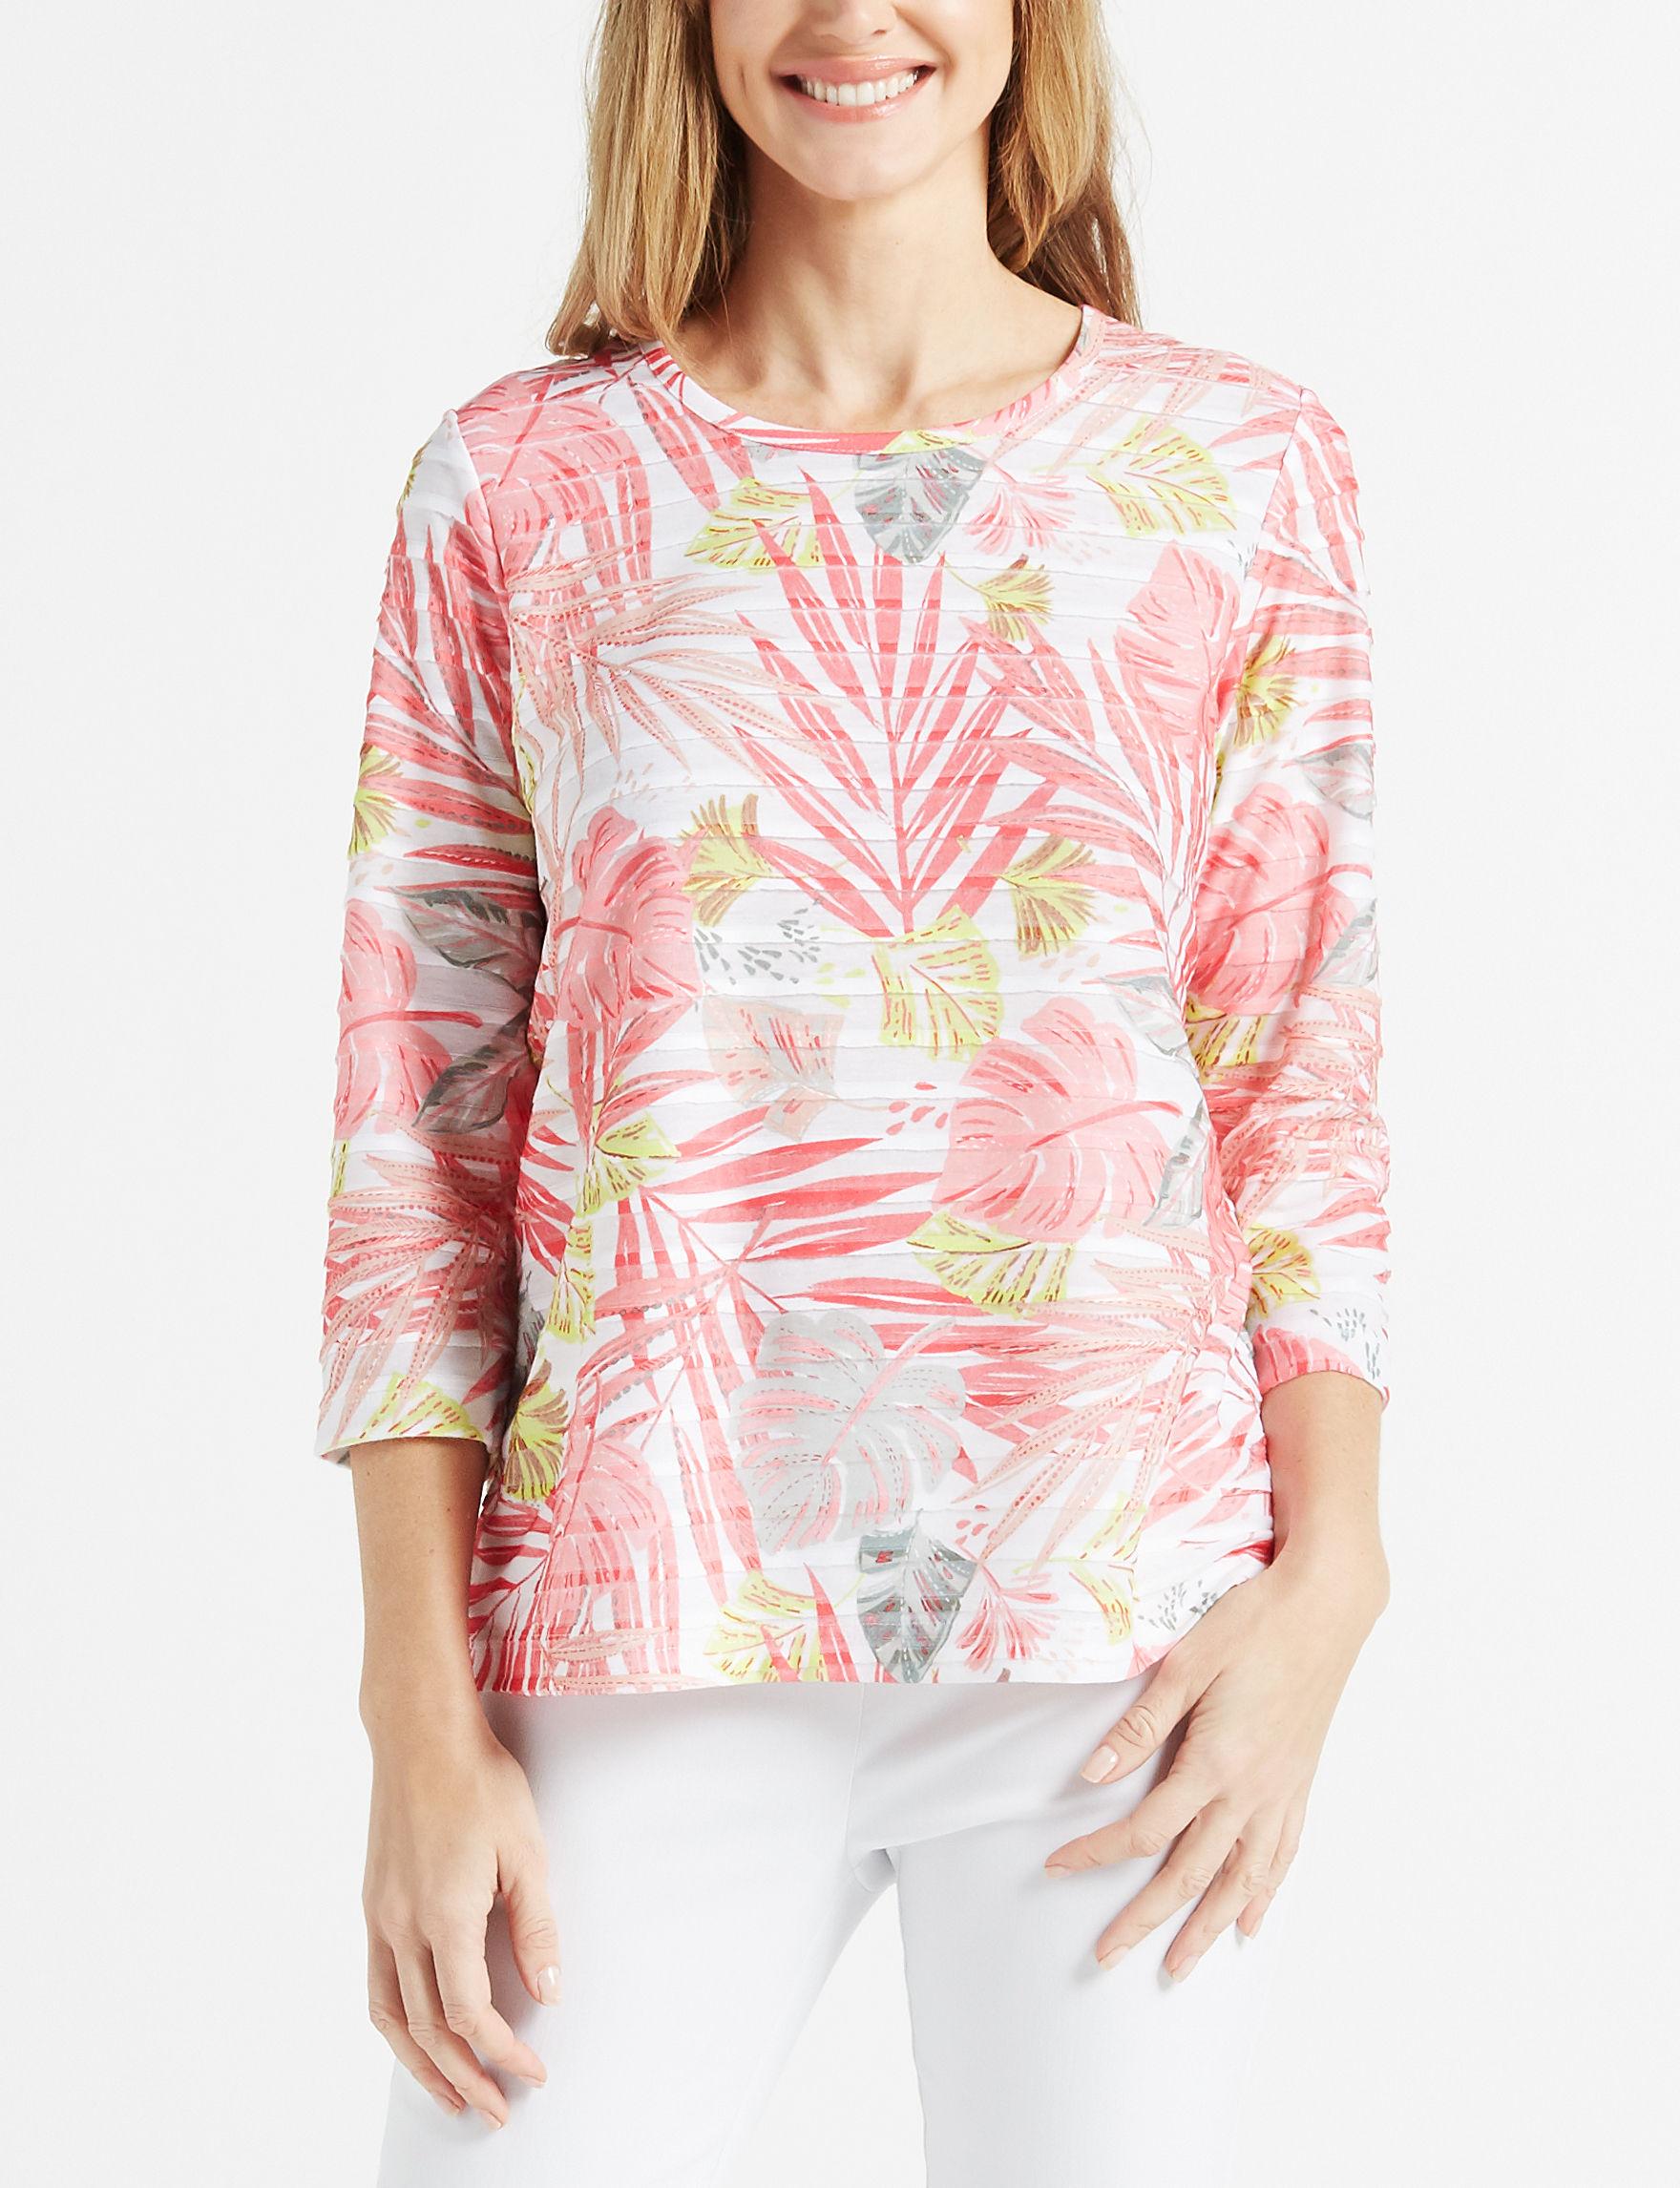 Rebecca Malone White / Coral Shirts & Blouses